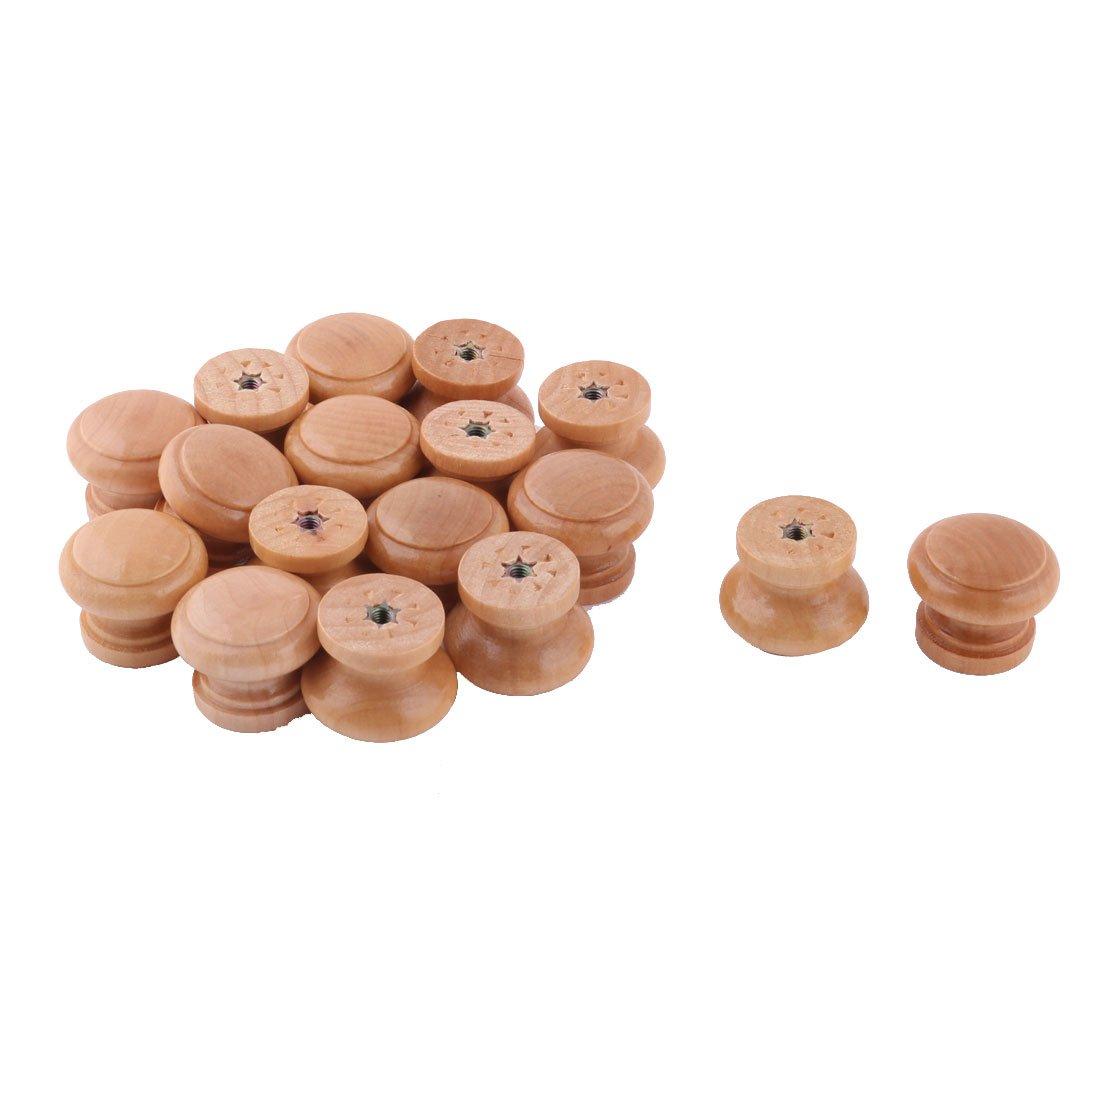 uxcell Bedroom Mushroom Design Dresser Drawer Closet Handgrip Pull Knob 17pcs Wood Color